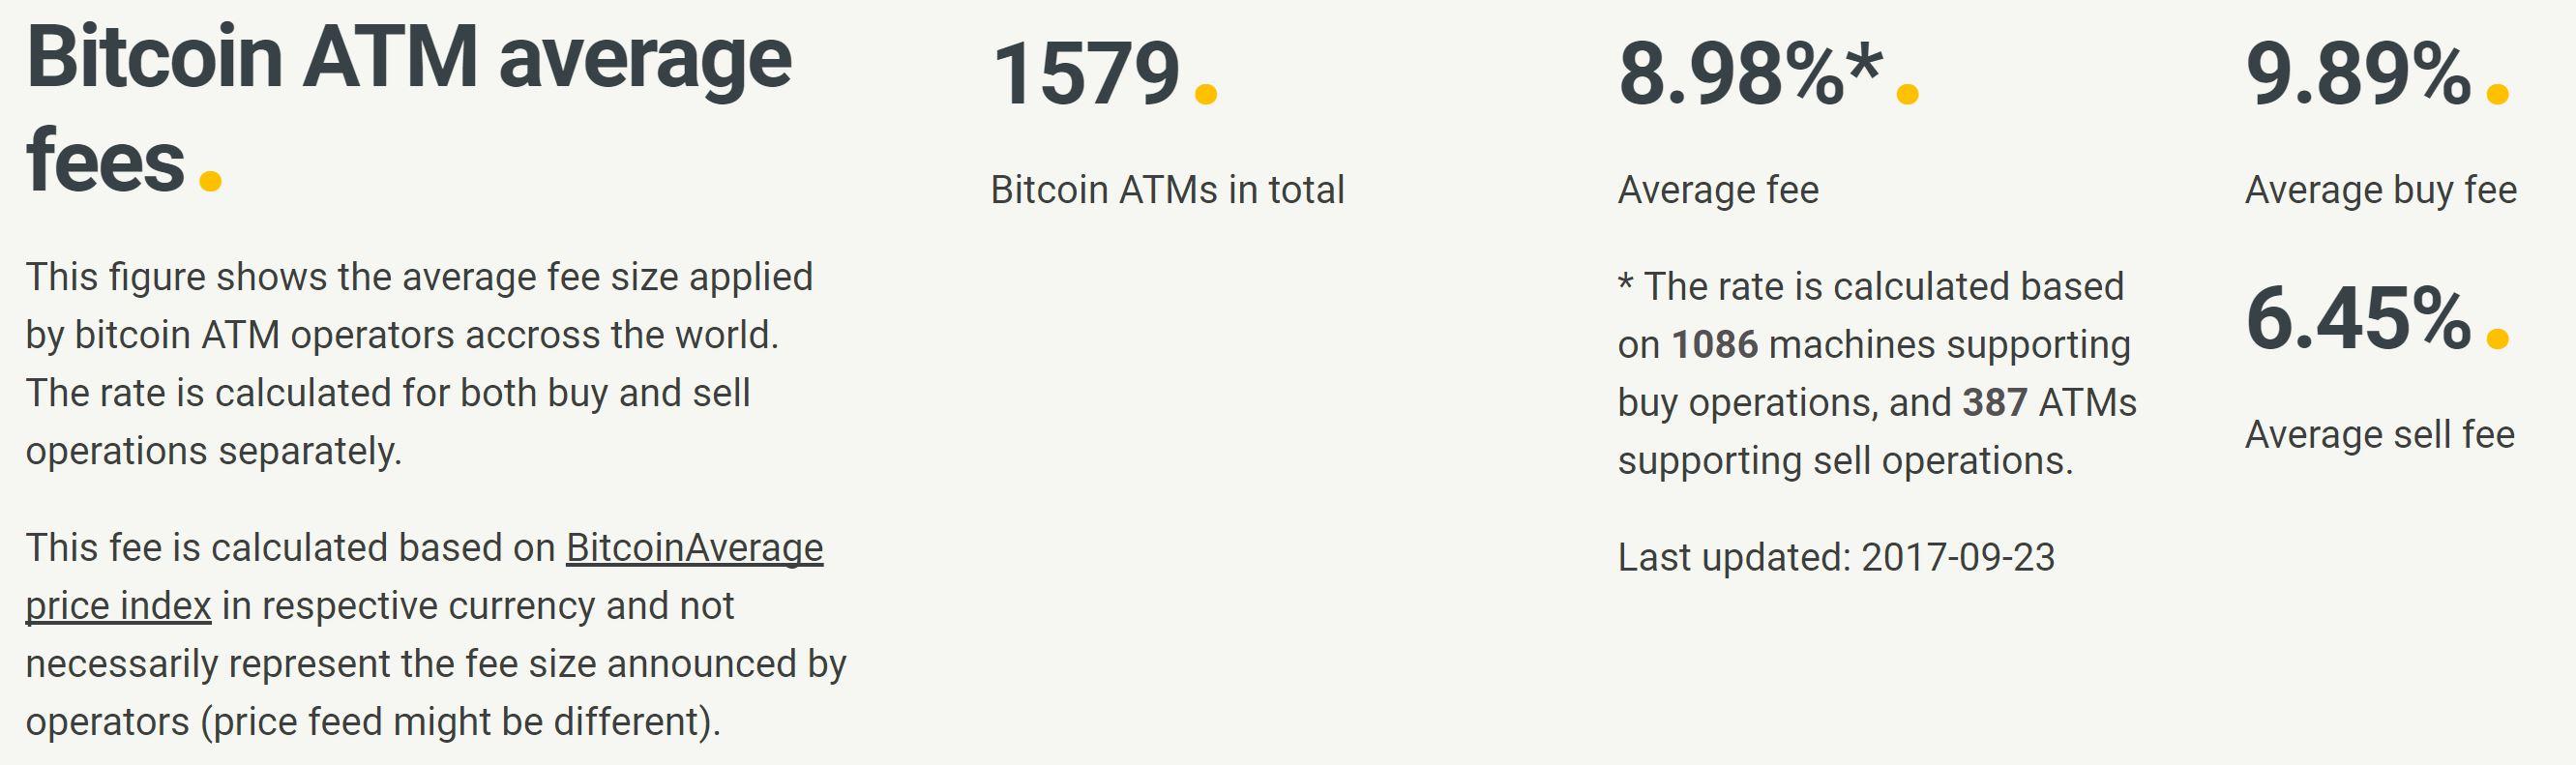 Bitcoin Cash Transaction Time Pluton Coin Exchange Values -